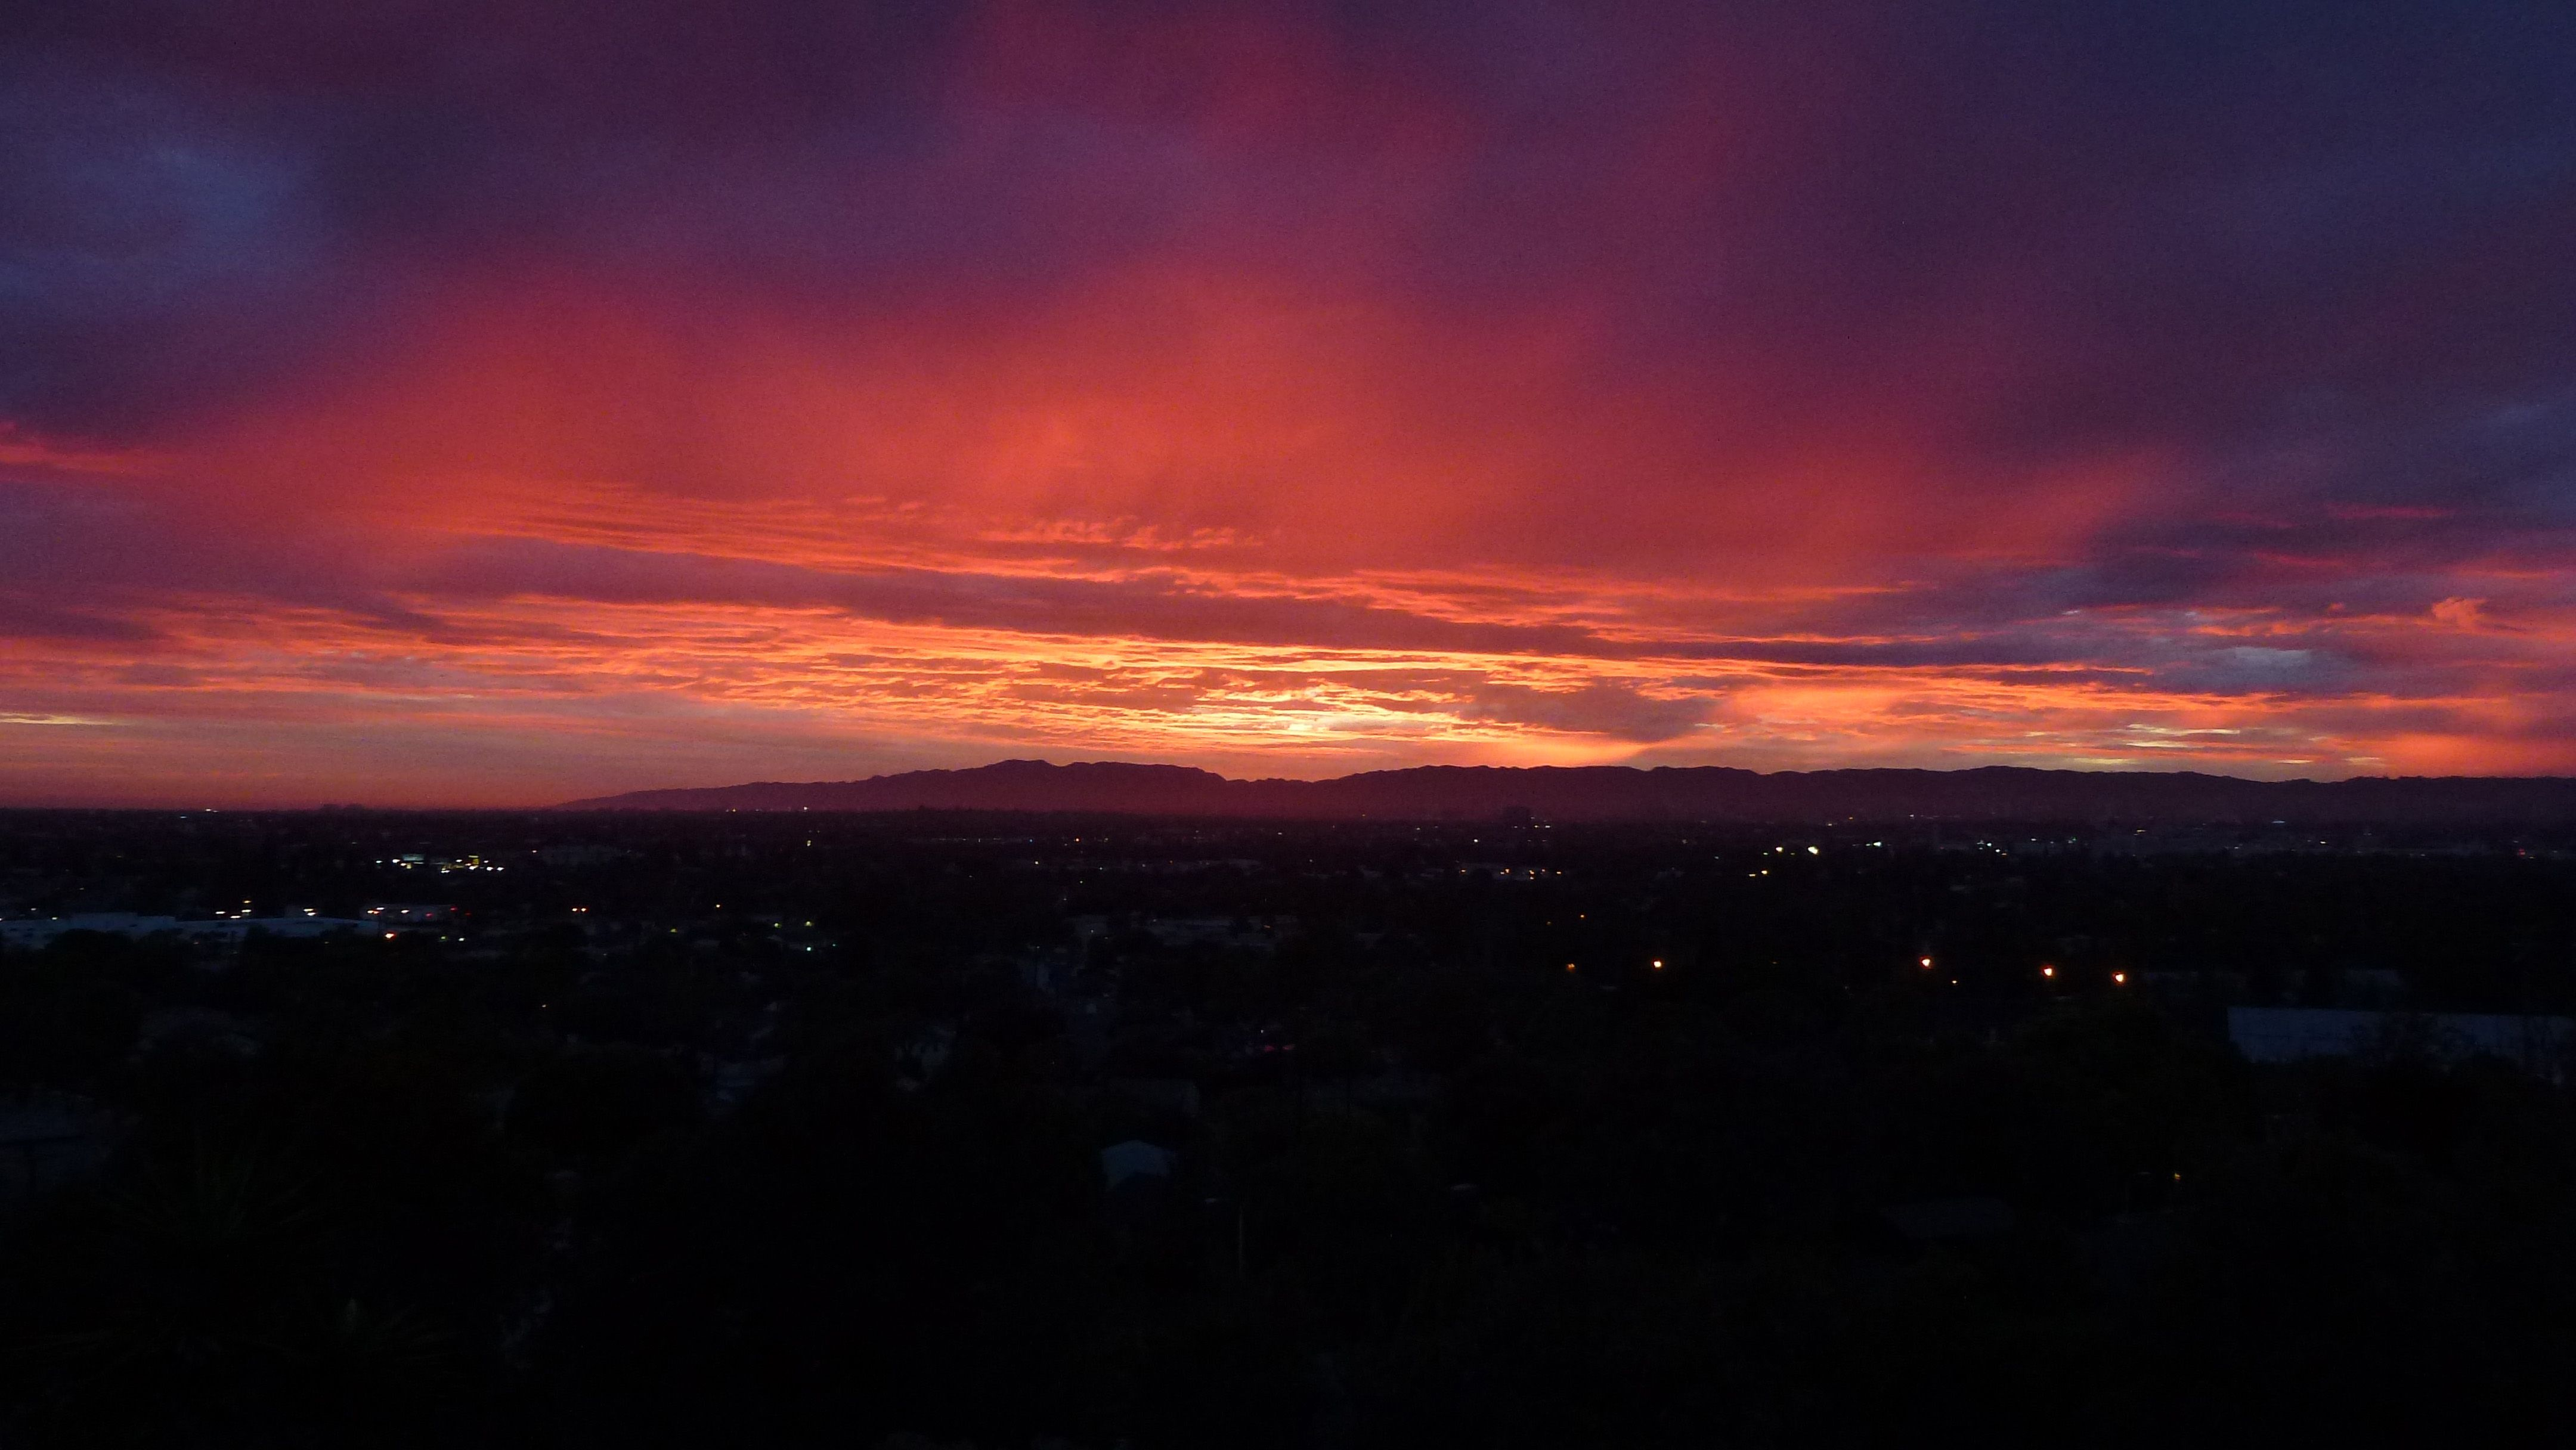 Red sky at sunrise pdf free download windows 10